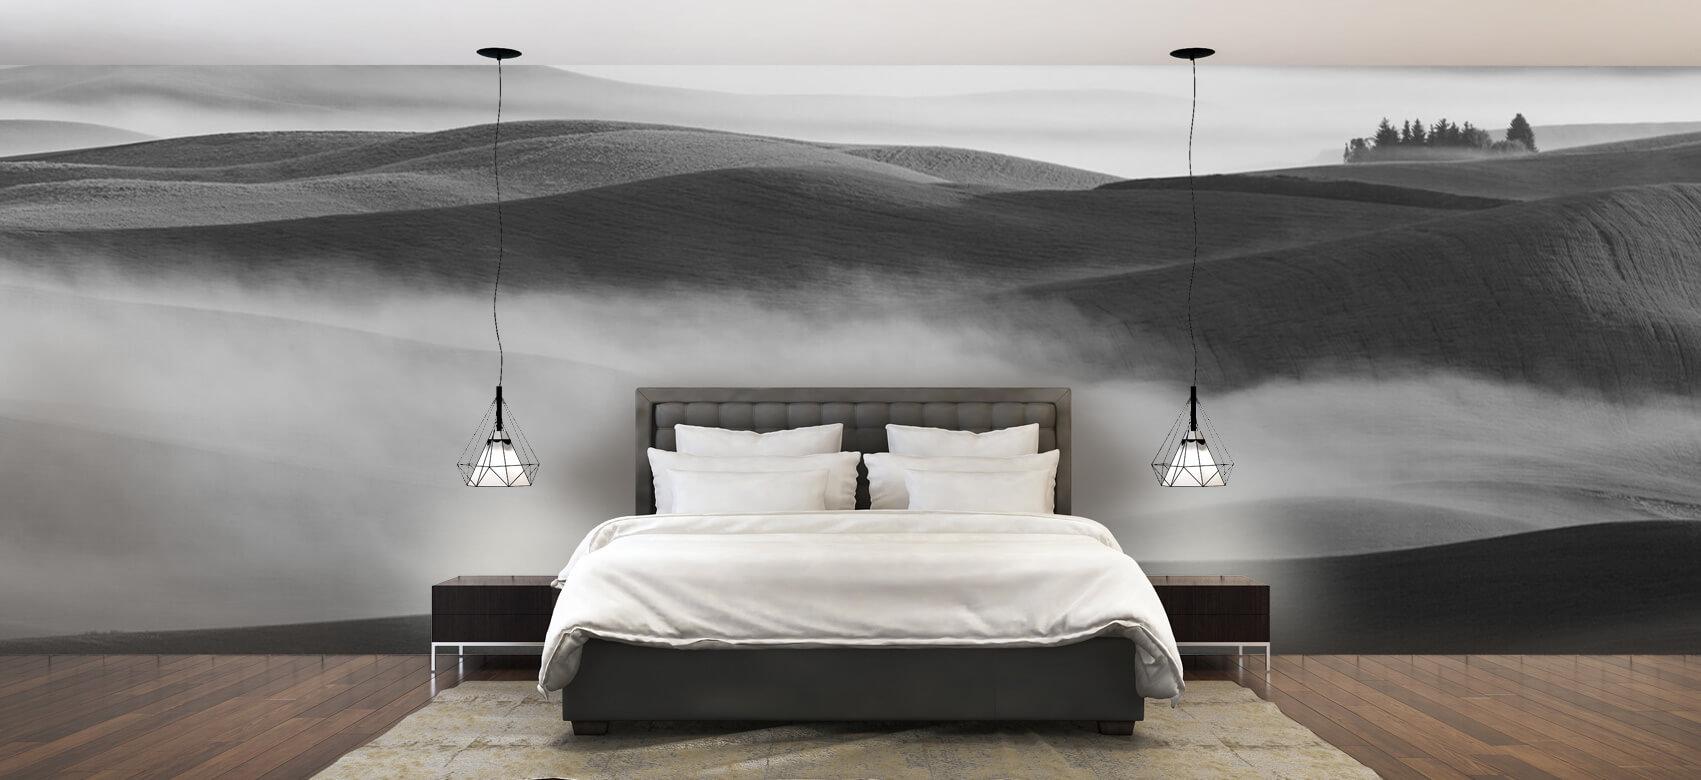 Landschap Dream Land in Morning Mist 2